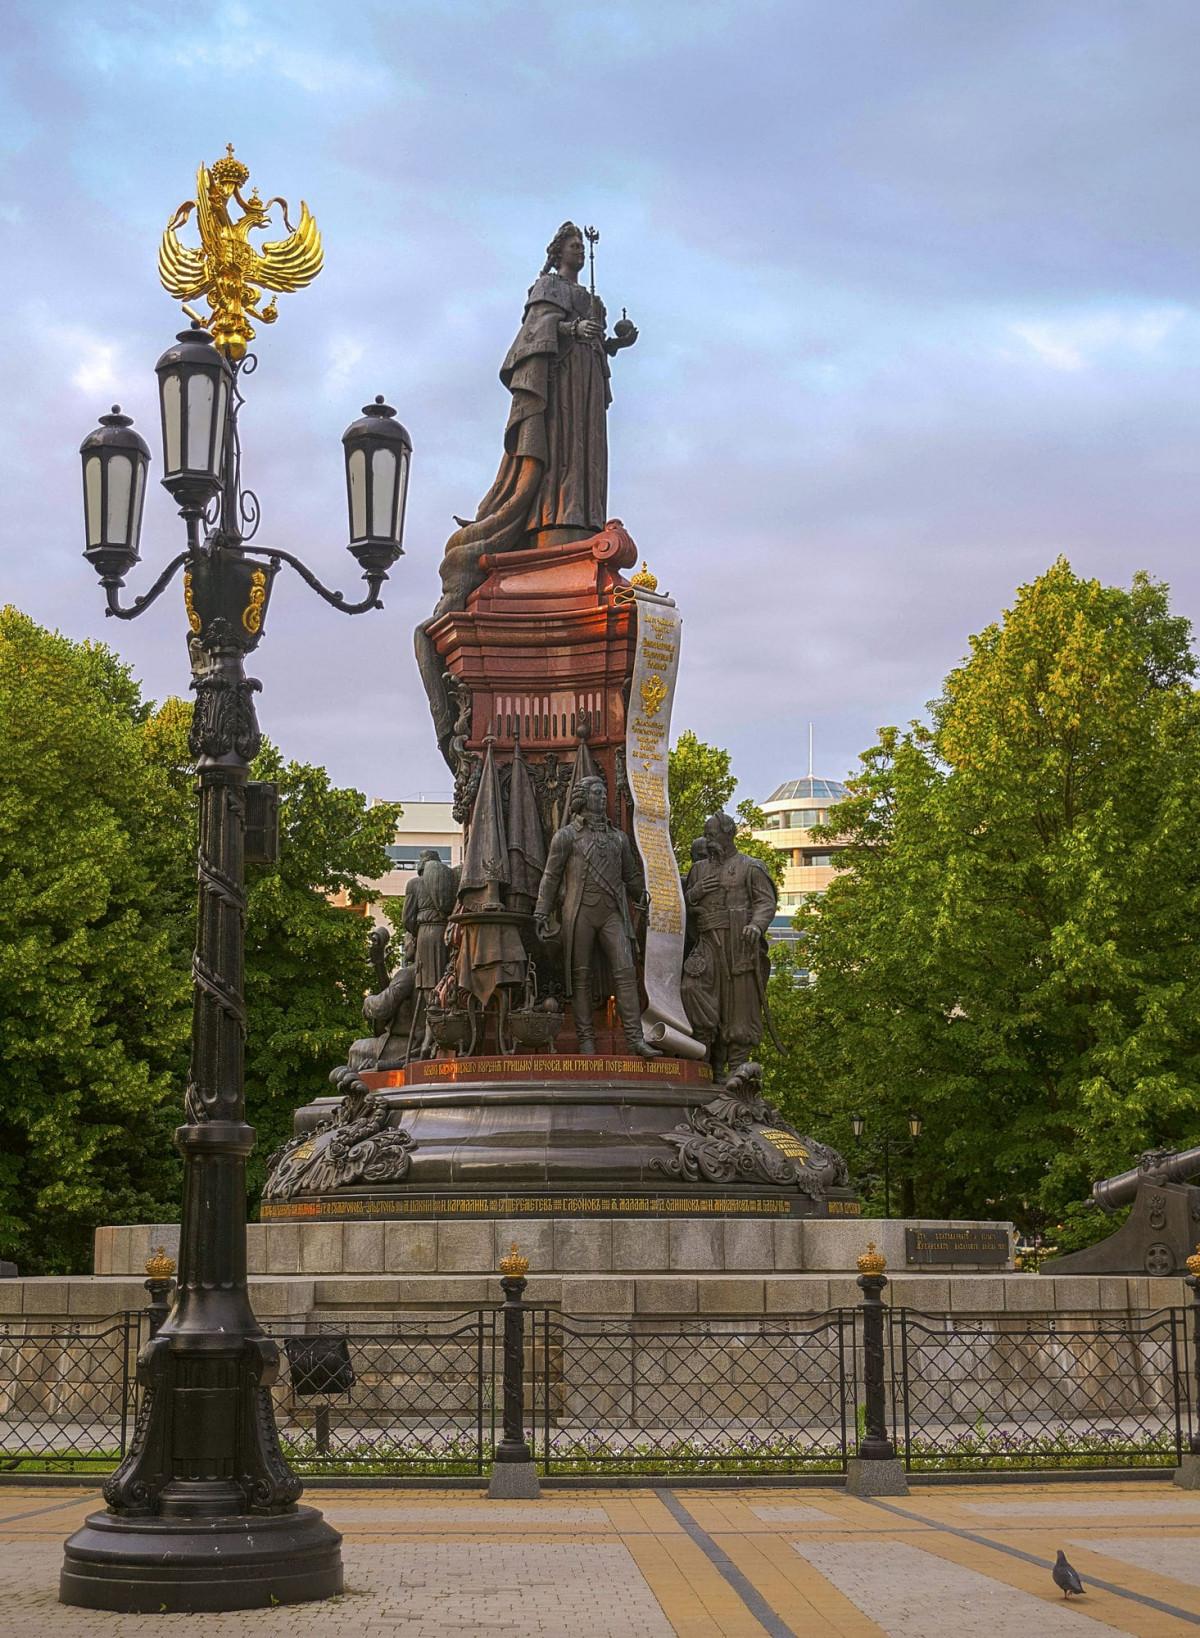 Фото: Памятник Екатерине II